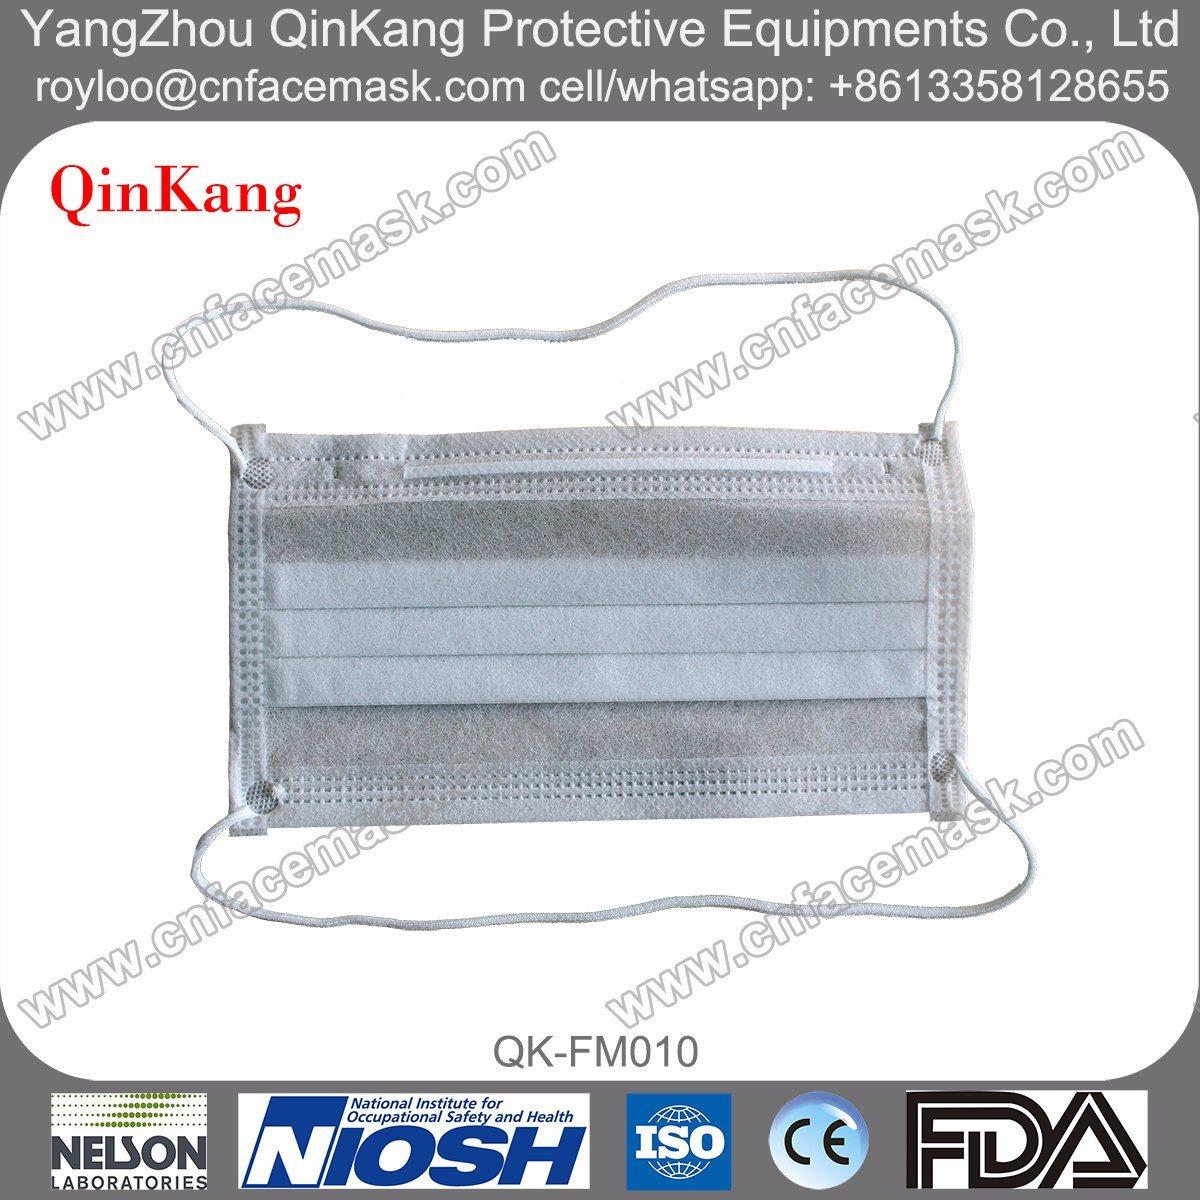 Disposable Nonwoven 3ply Headloop Protective Face Mask